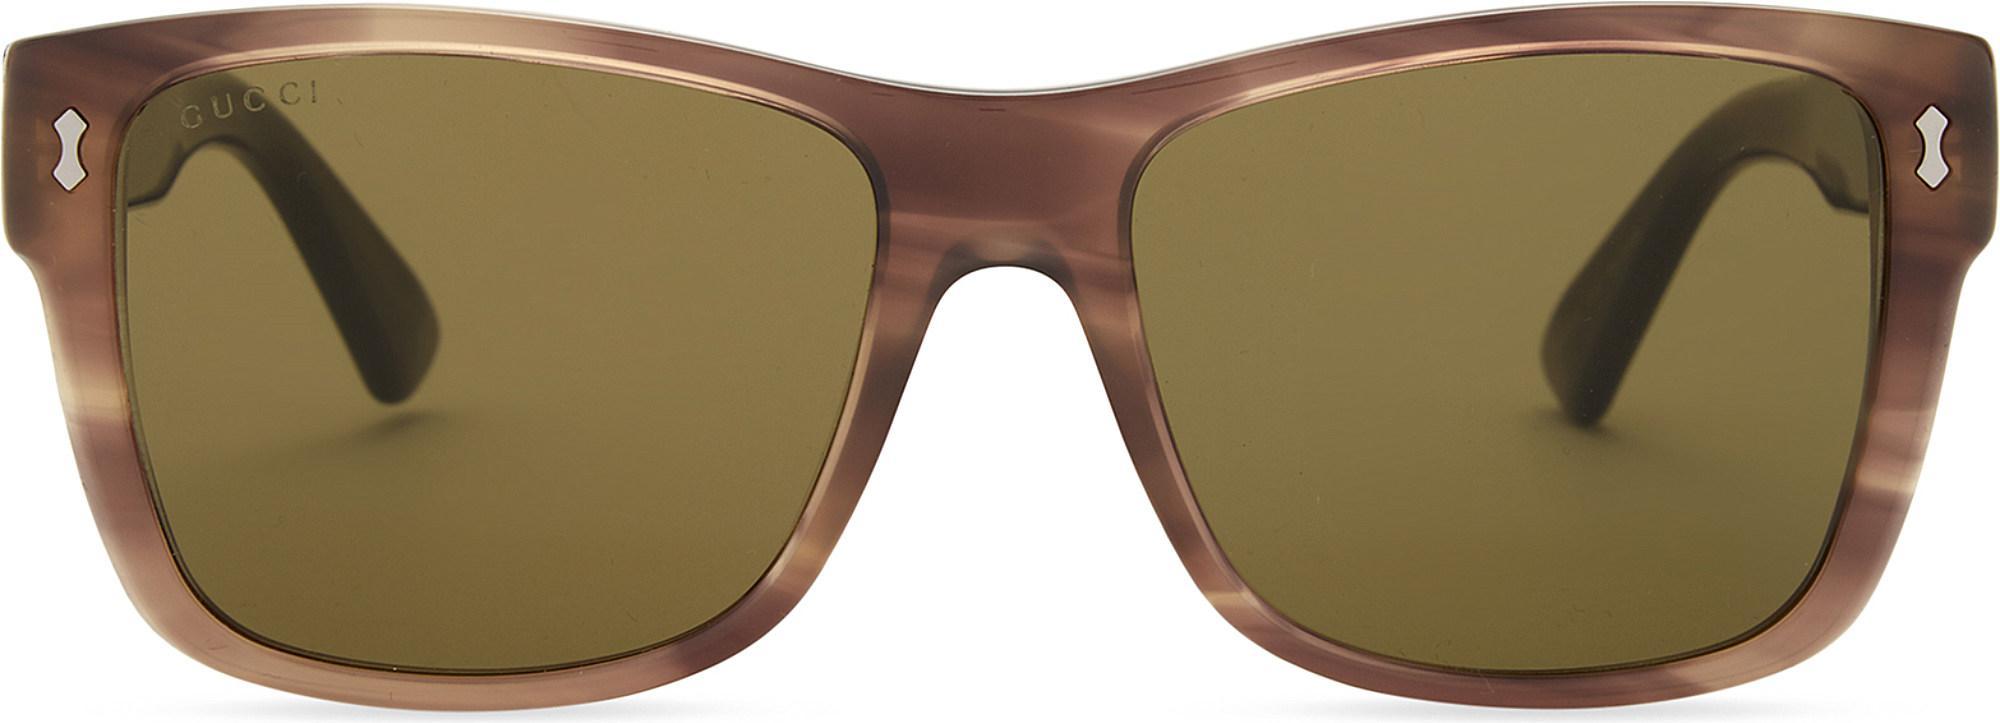 ff55ba18e5d Gucci - Brown Gg0052s Square-frame Sunglasses - Lyst. View fullscreen